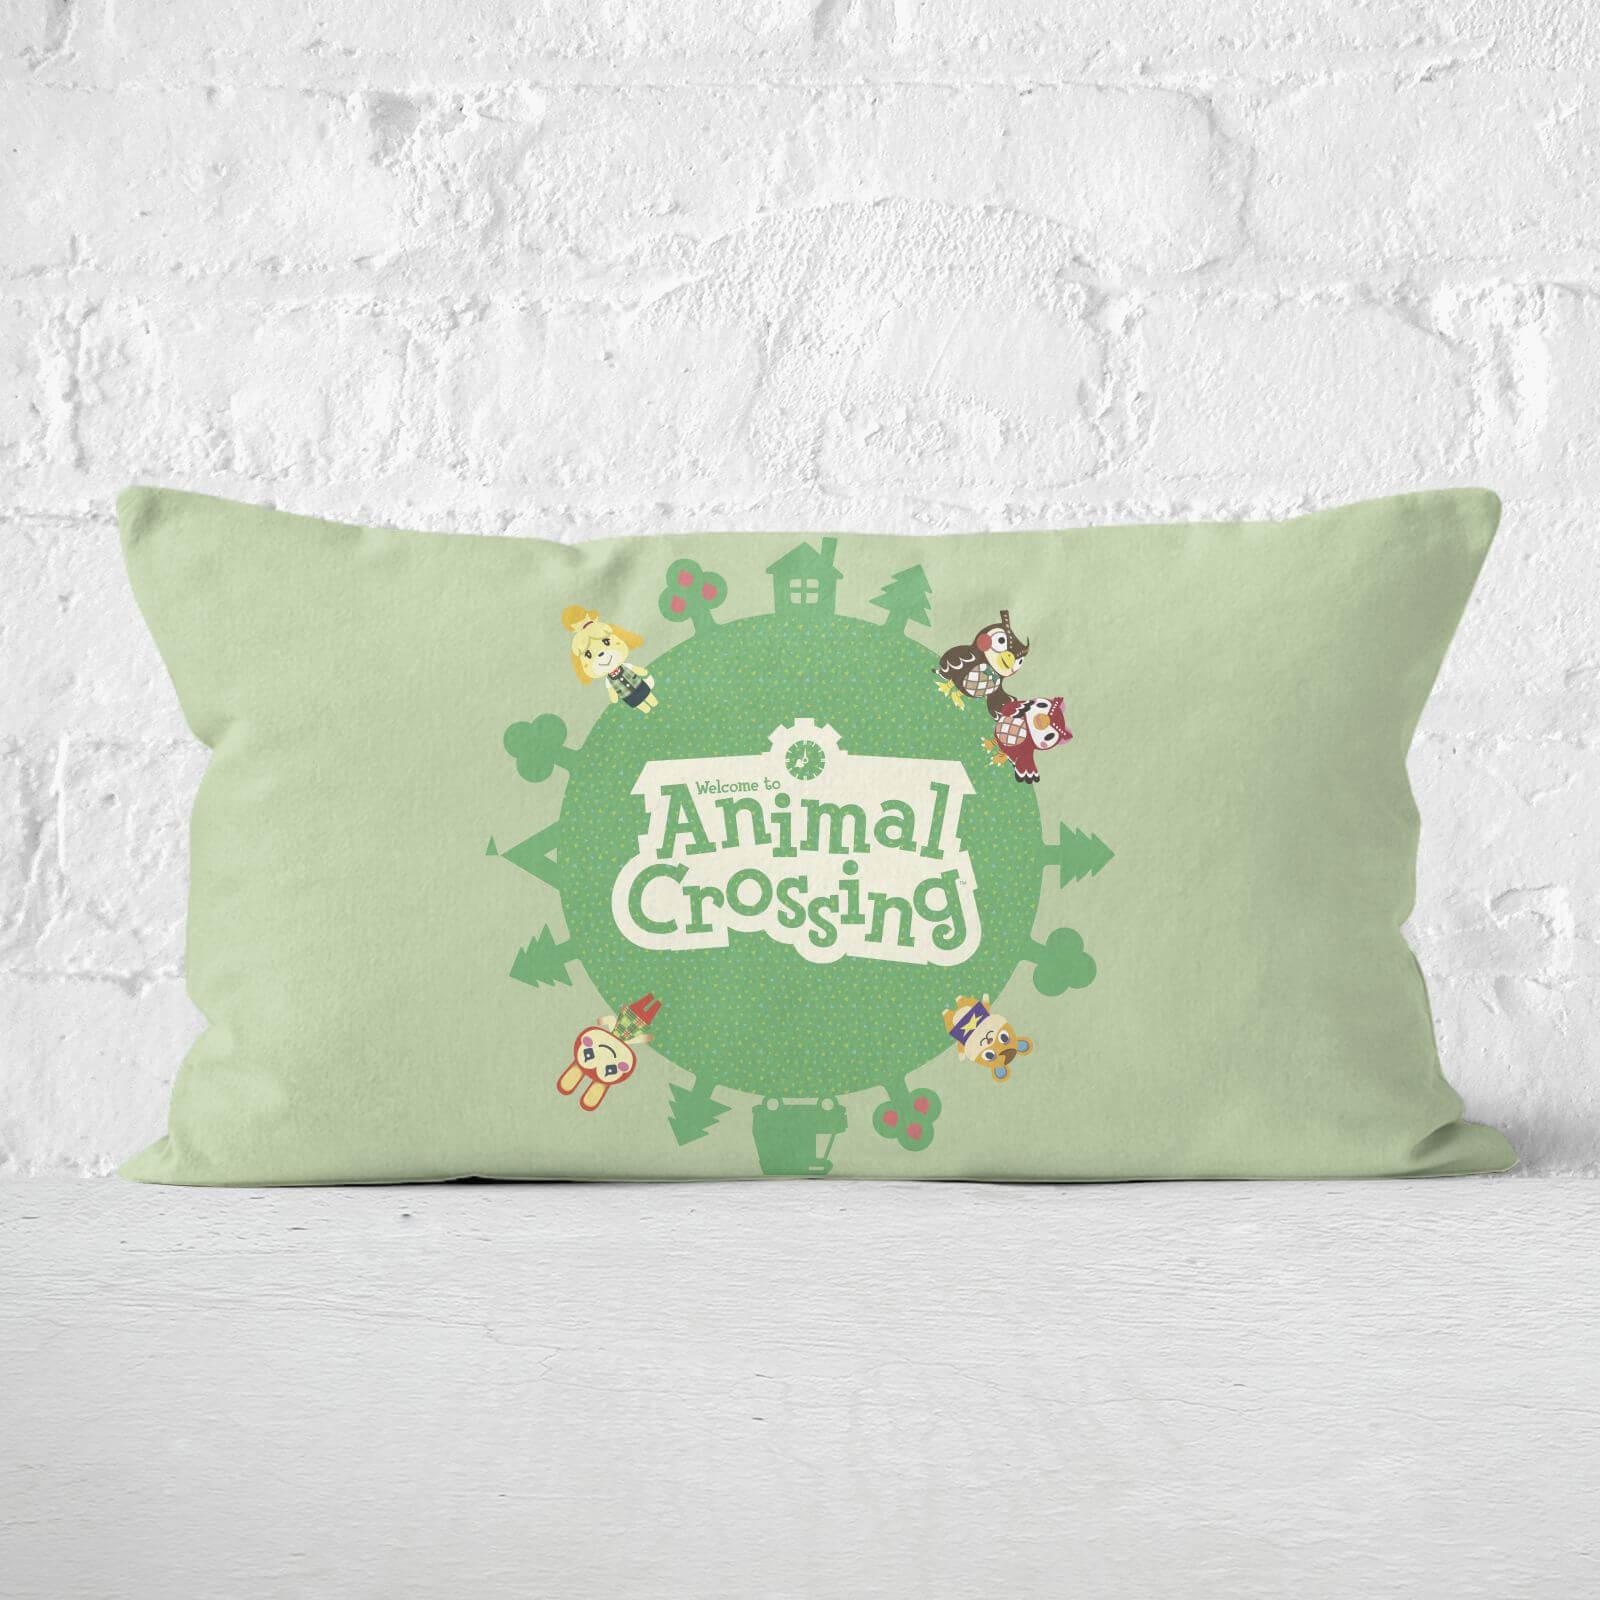 Animal Crossing Rectangular Cushion - 30x50cm - Eco Friendly